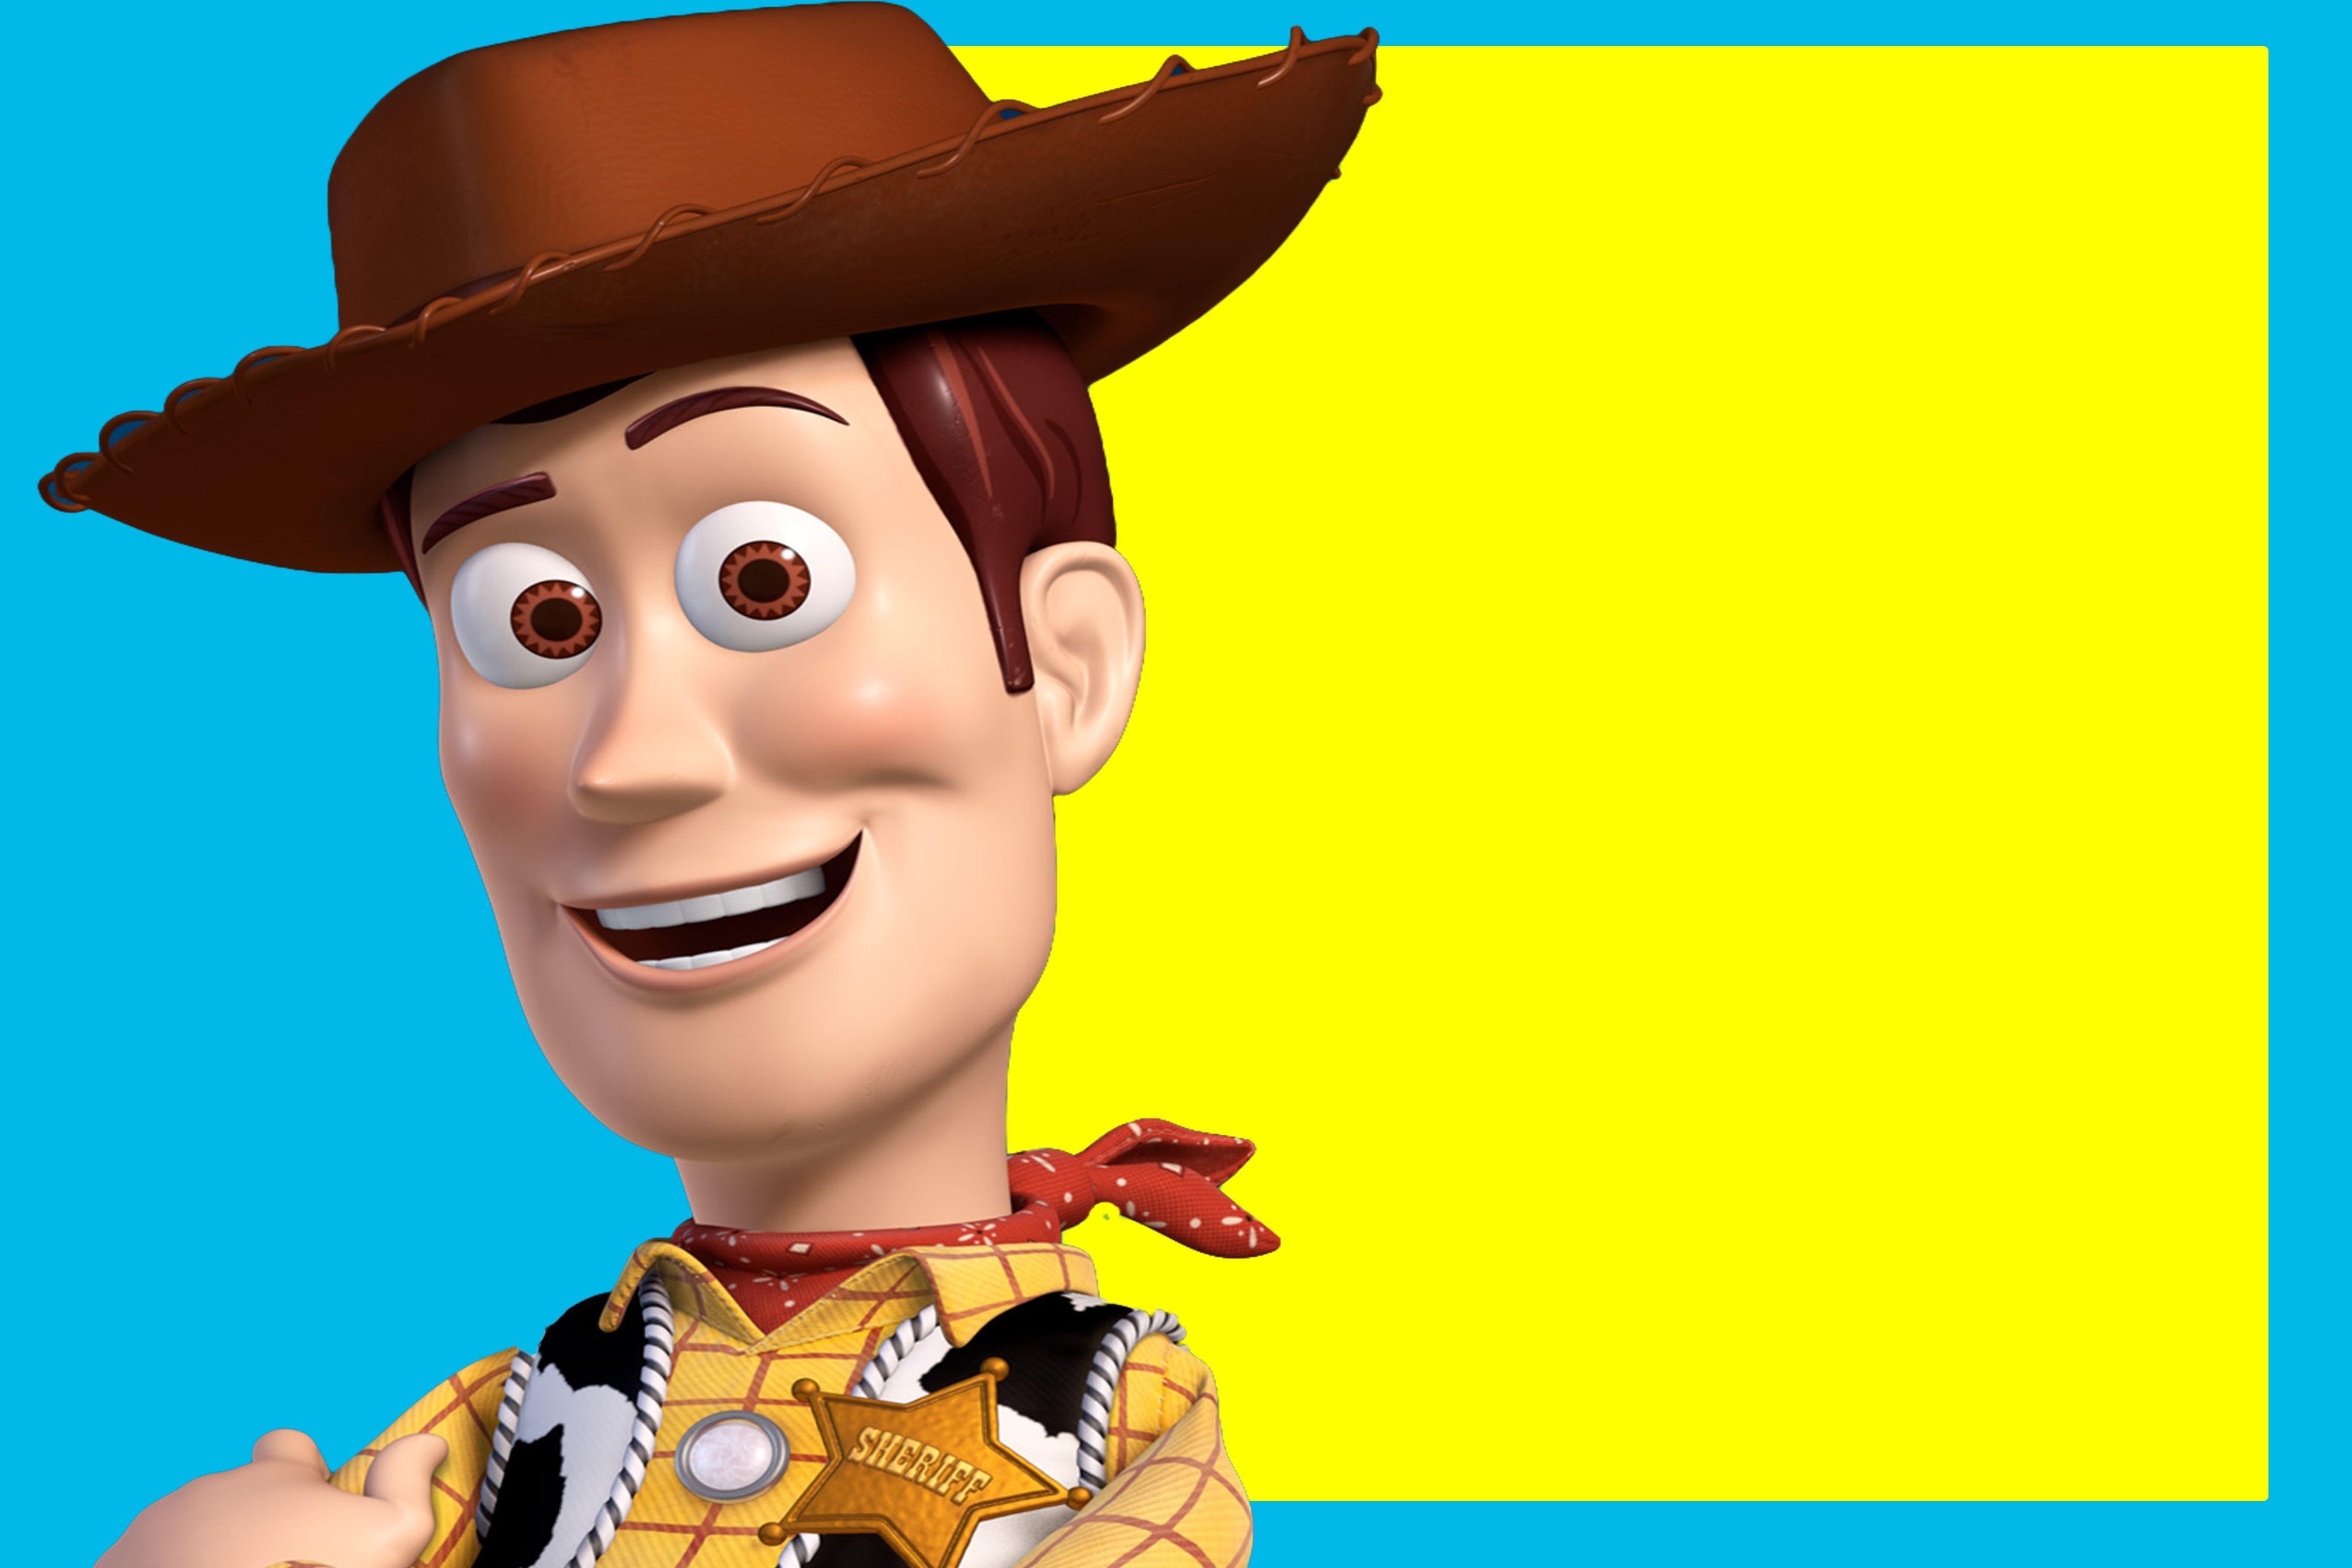 WallpaperMISC Toy Story HD Wallpaper 41 4500 X 3000